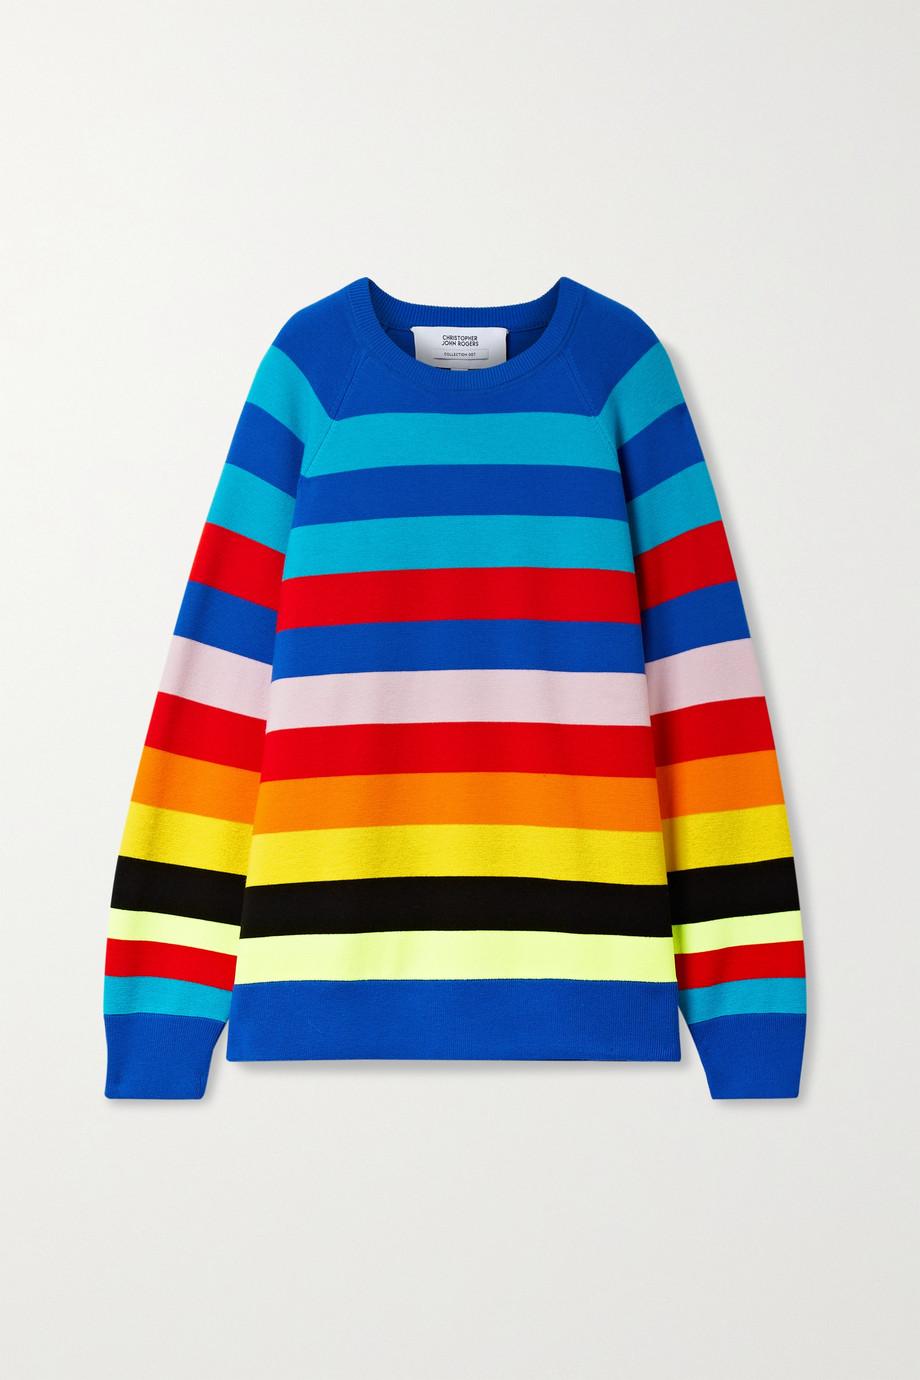 Christopher John Rogers Striped wool-blend sweater